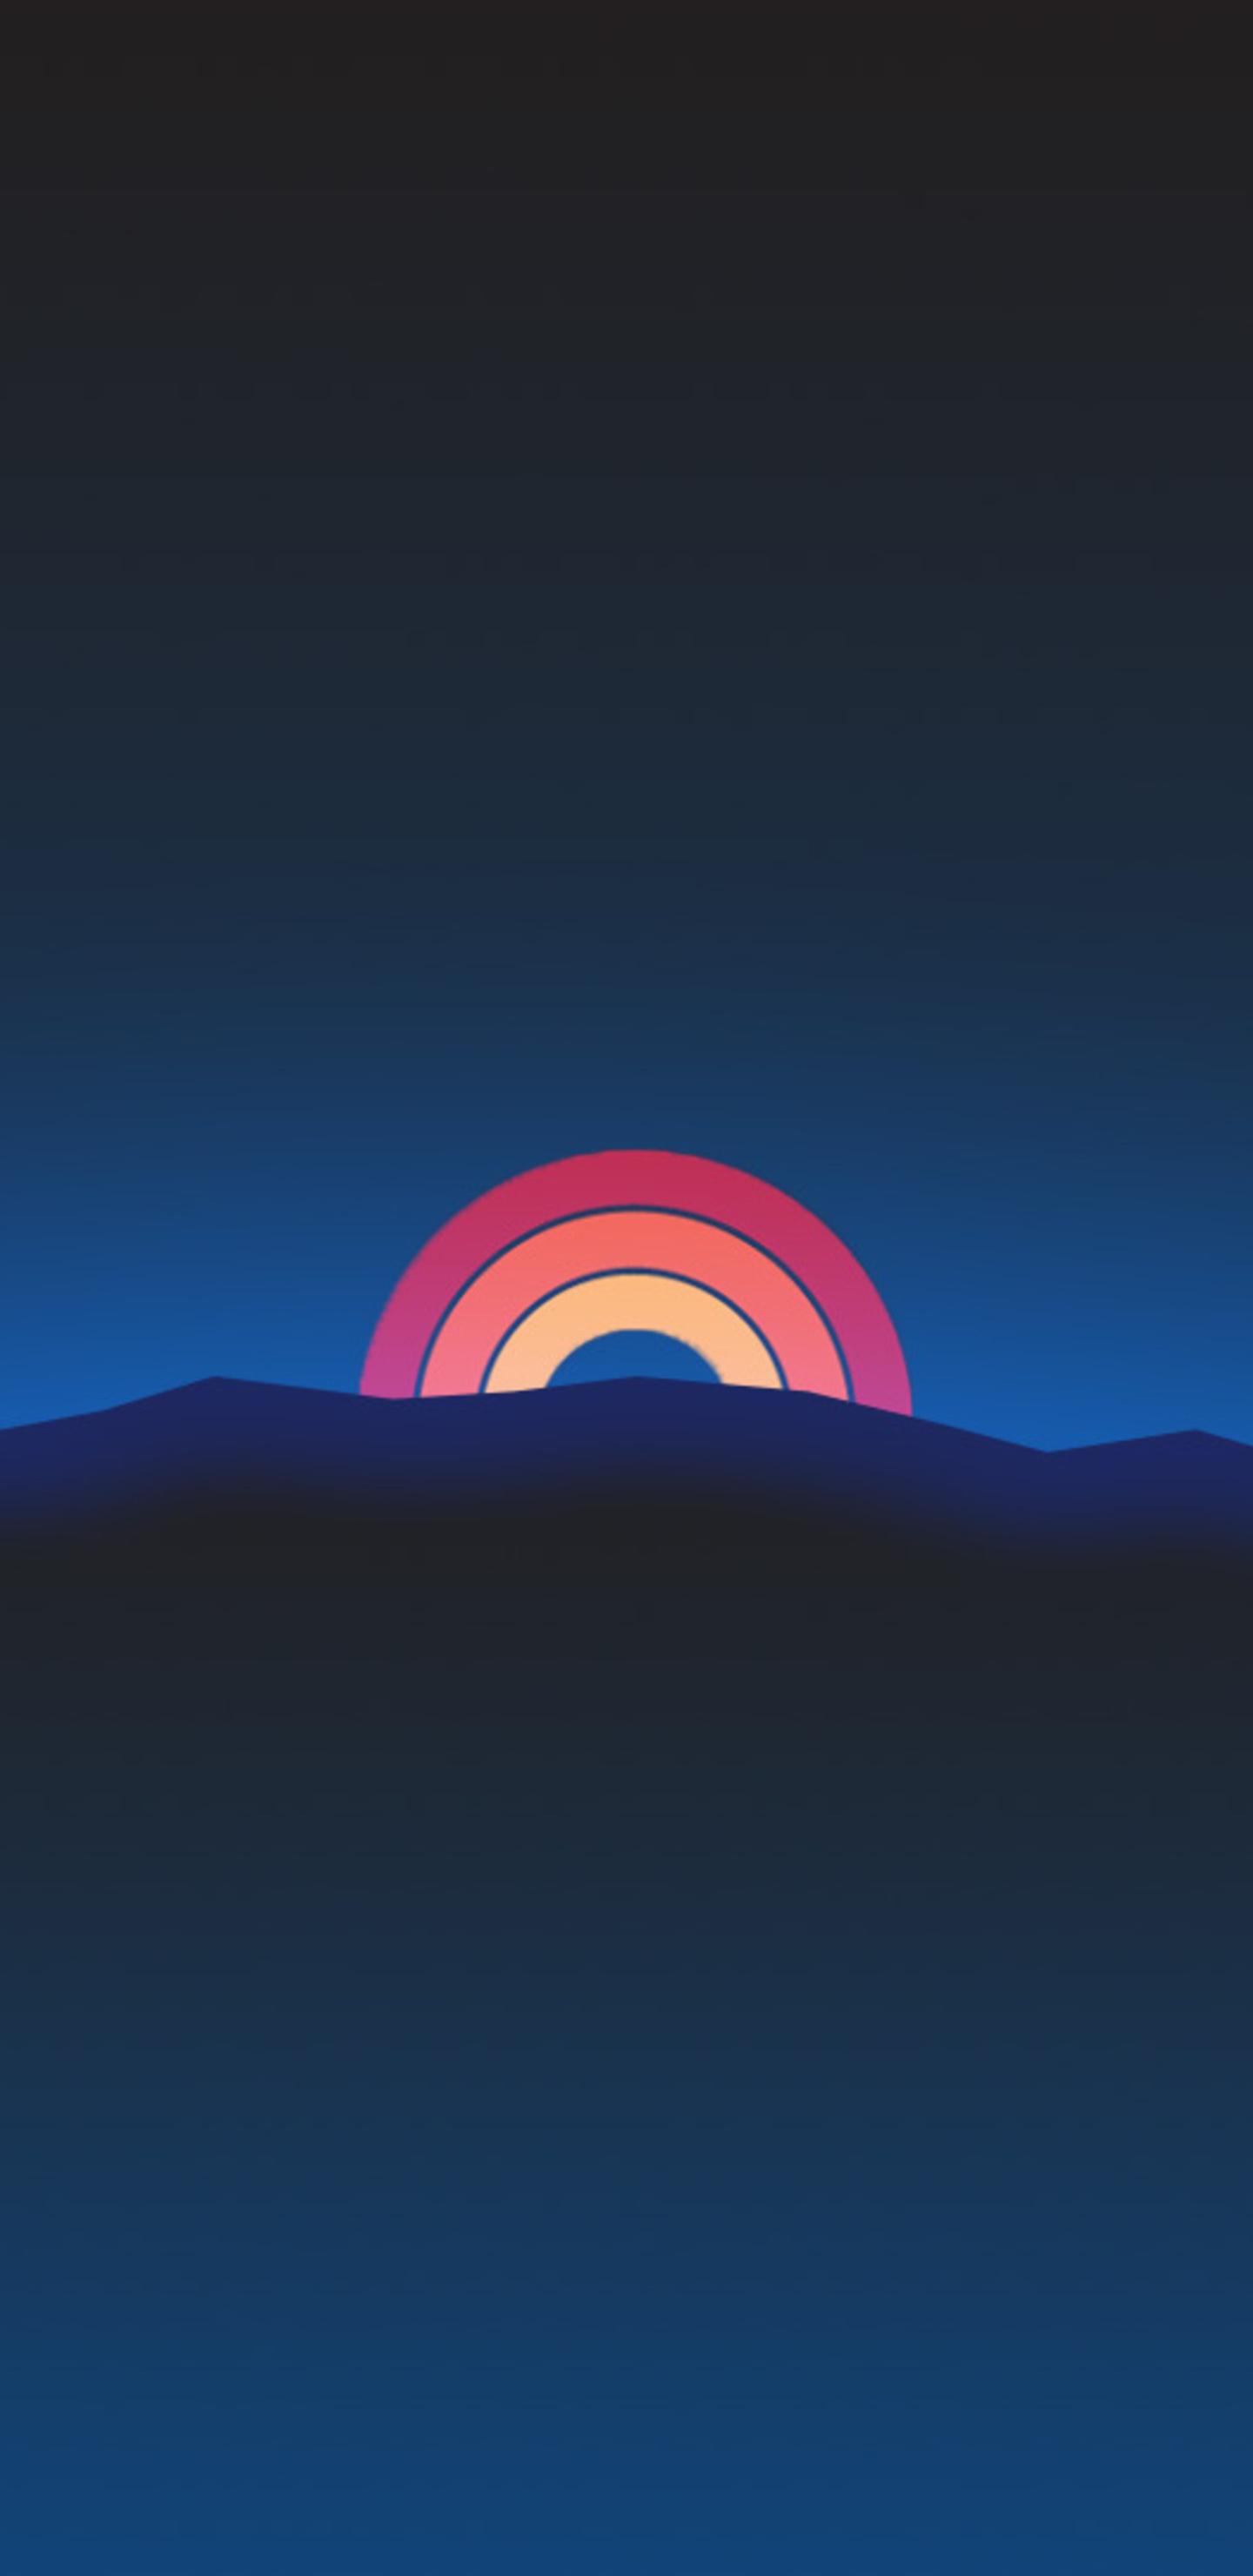 1440x2960 Minimalism Neon Rainbow Sunset Retro Style ...